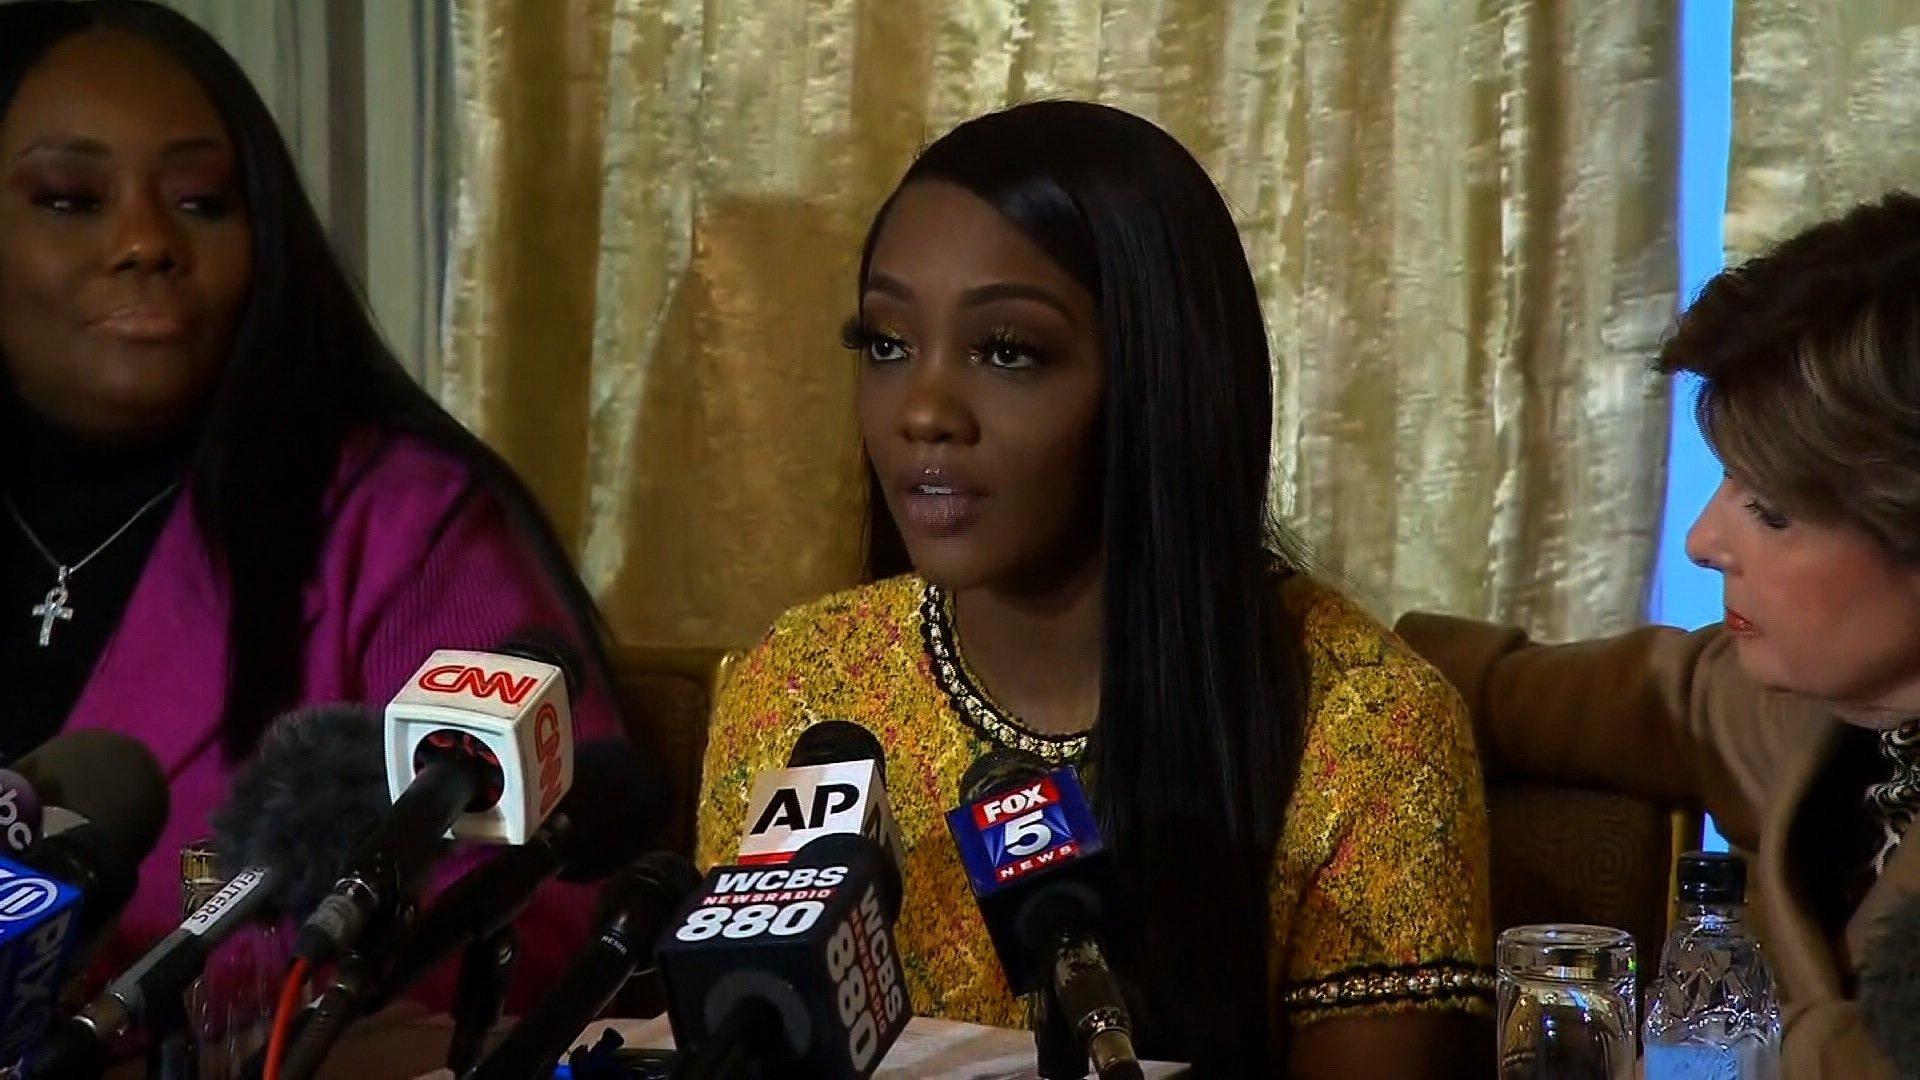 Singer R Kelly threatens rape accuser in signed legal